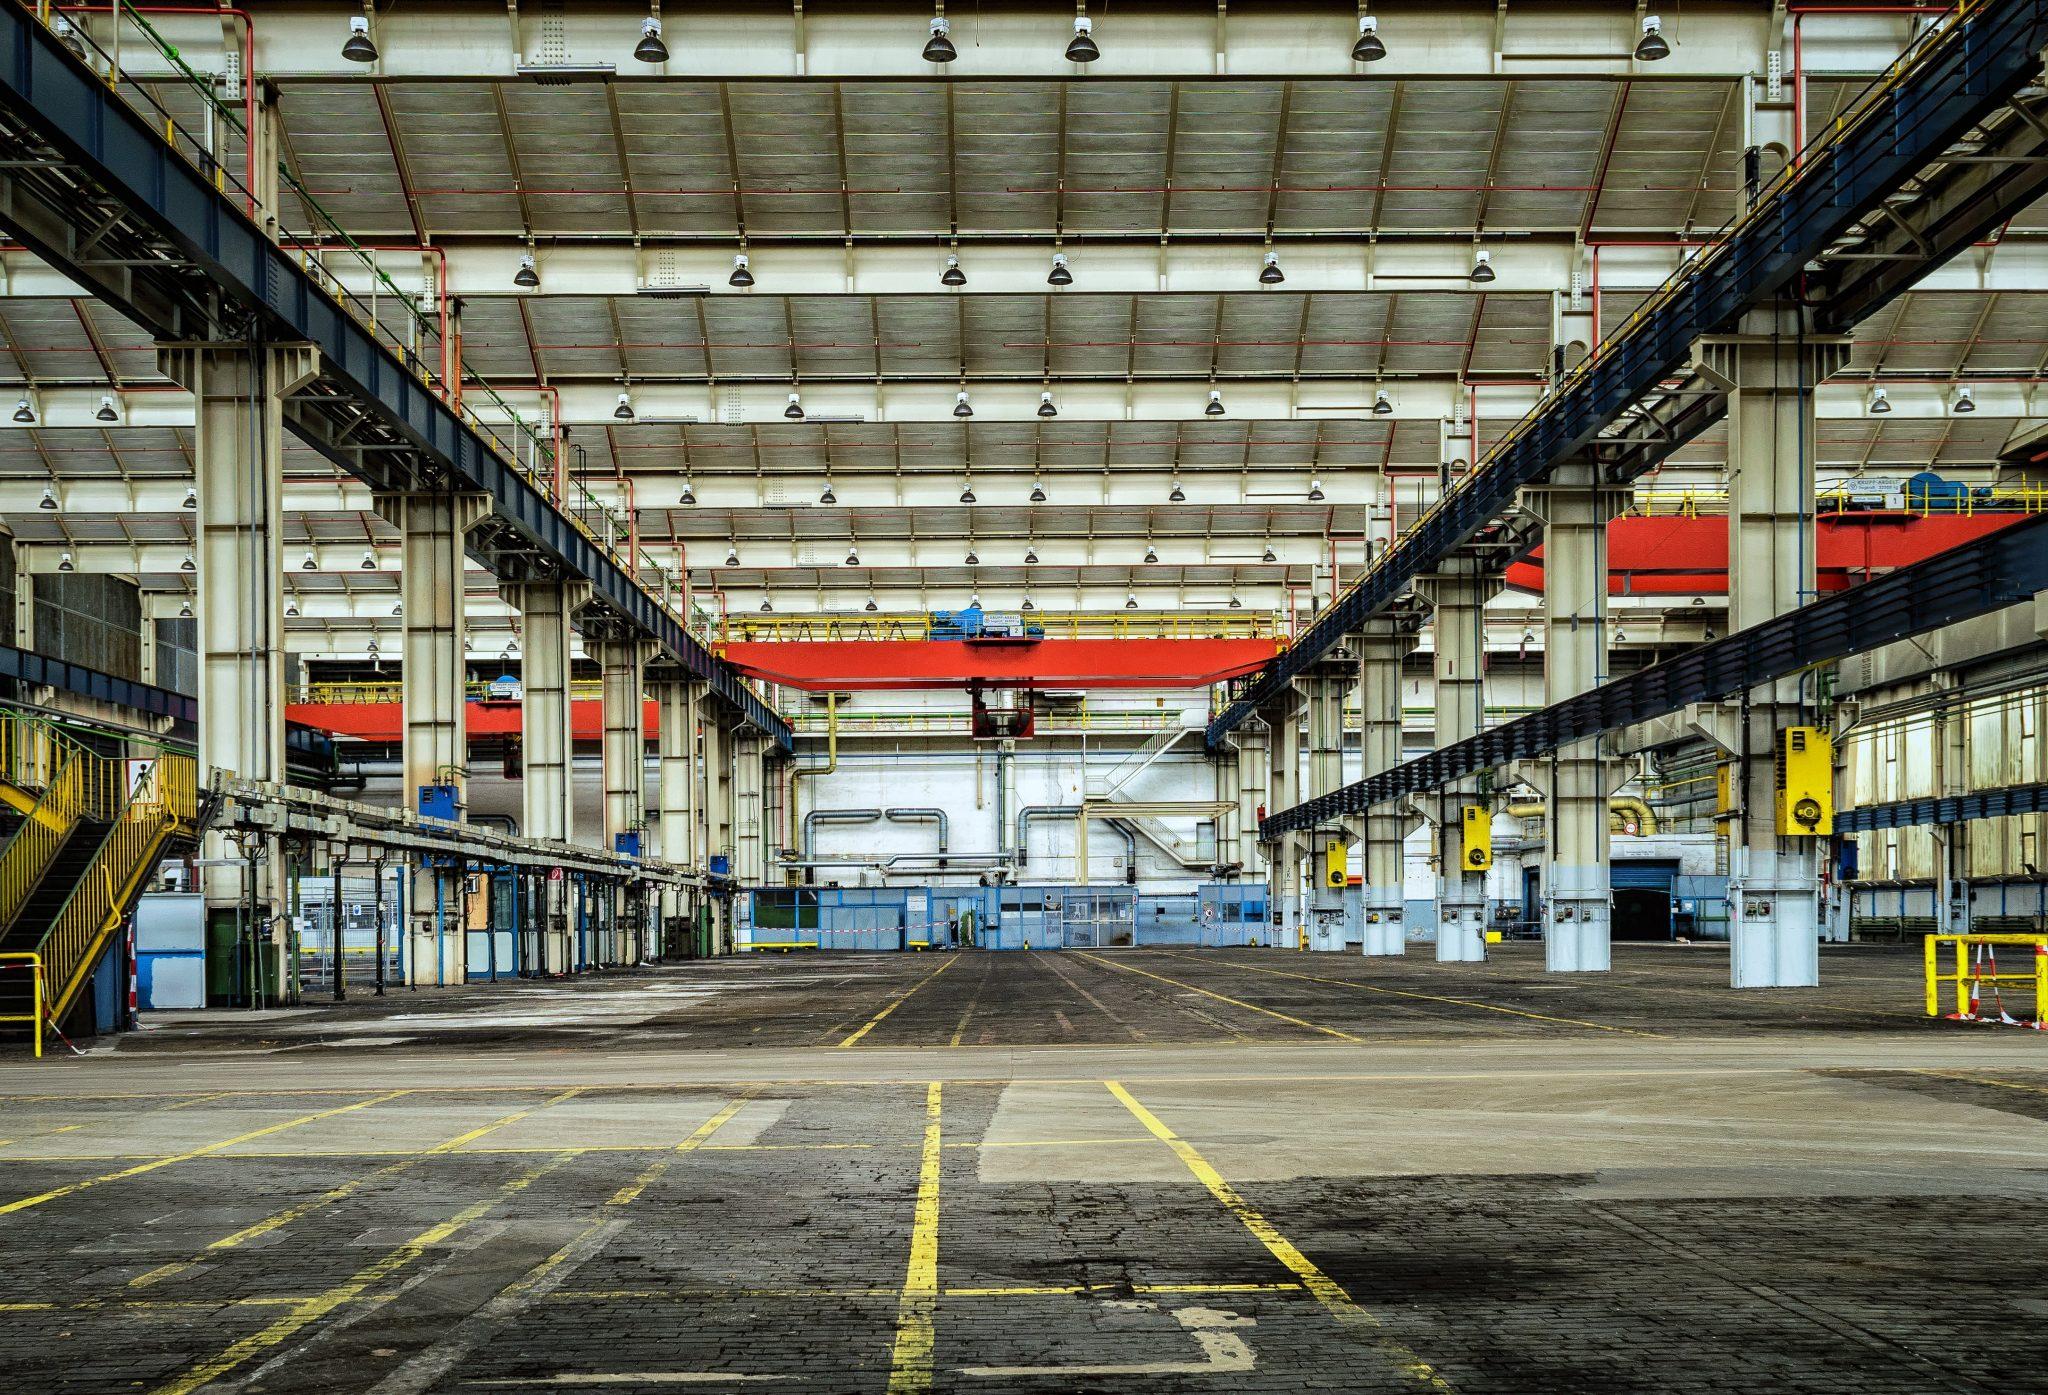 WarehouseBG3